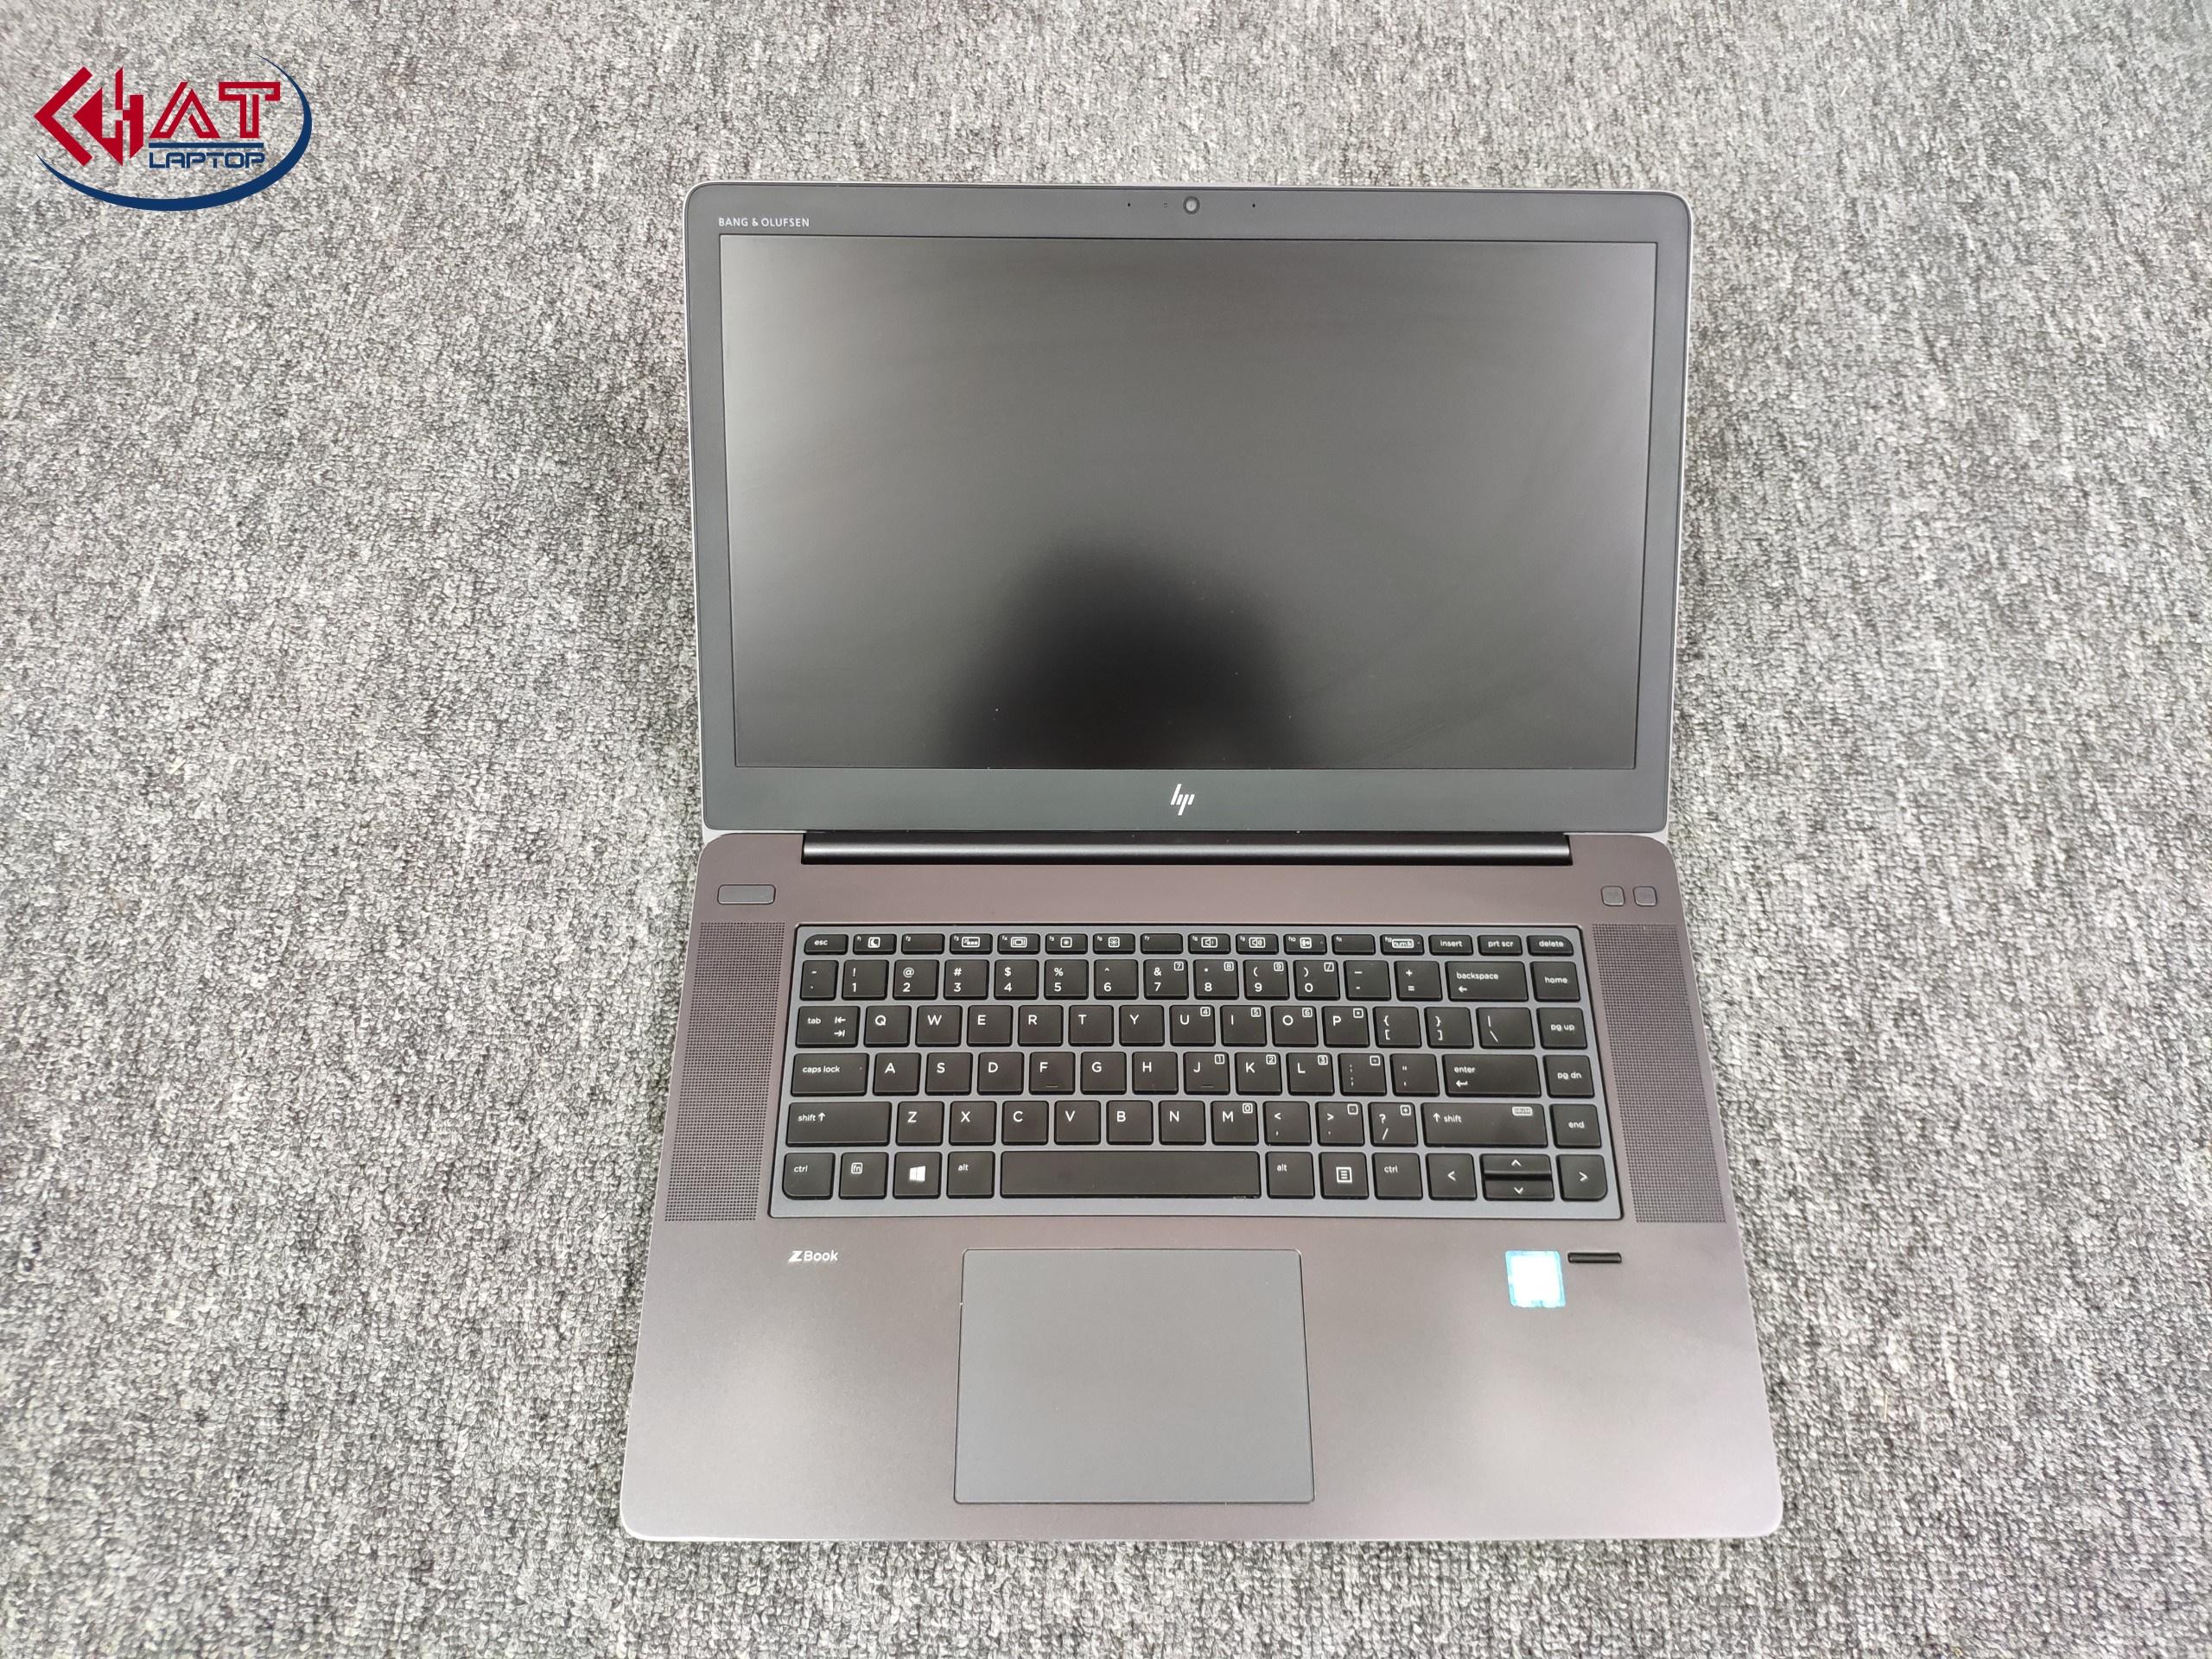 HP ZBook studio 15 G4 core i7-7700HQ, RAM 16GB, SSD 512Gb, Nvidia Quadro M1200, 15.6 inch Full HD